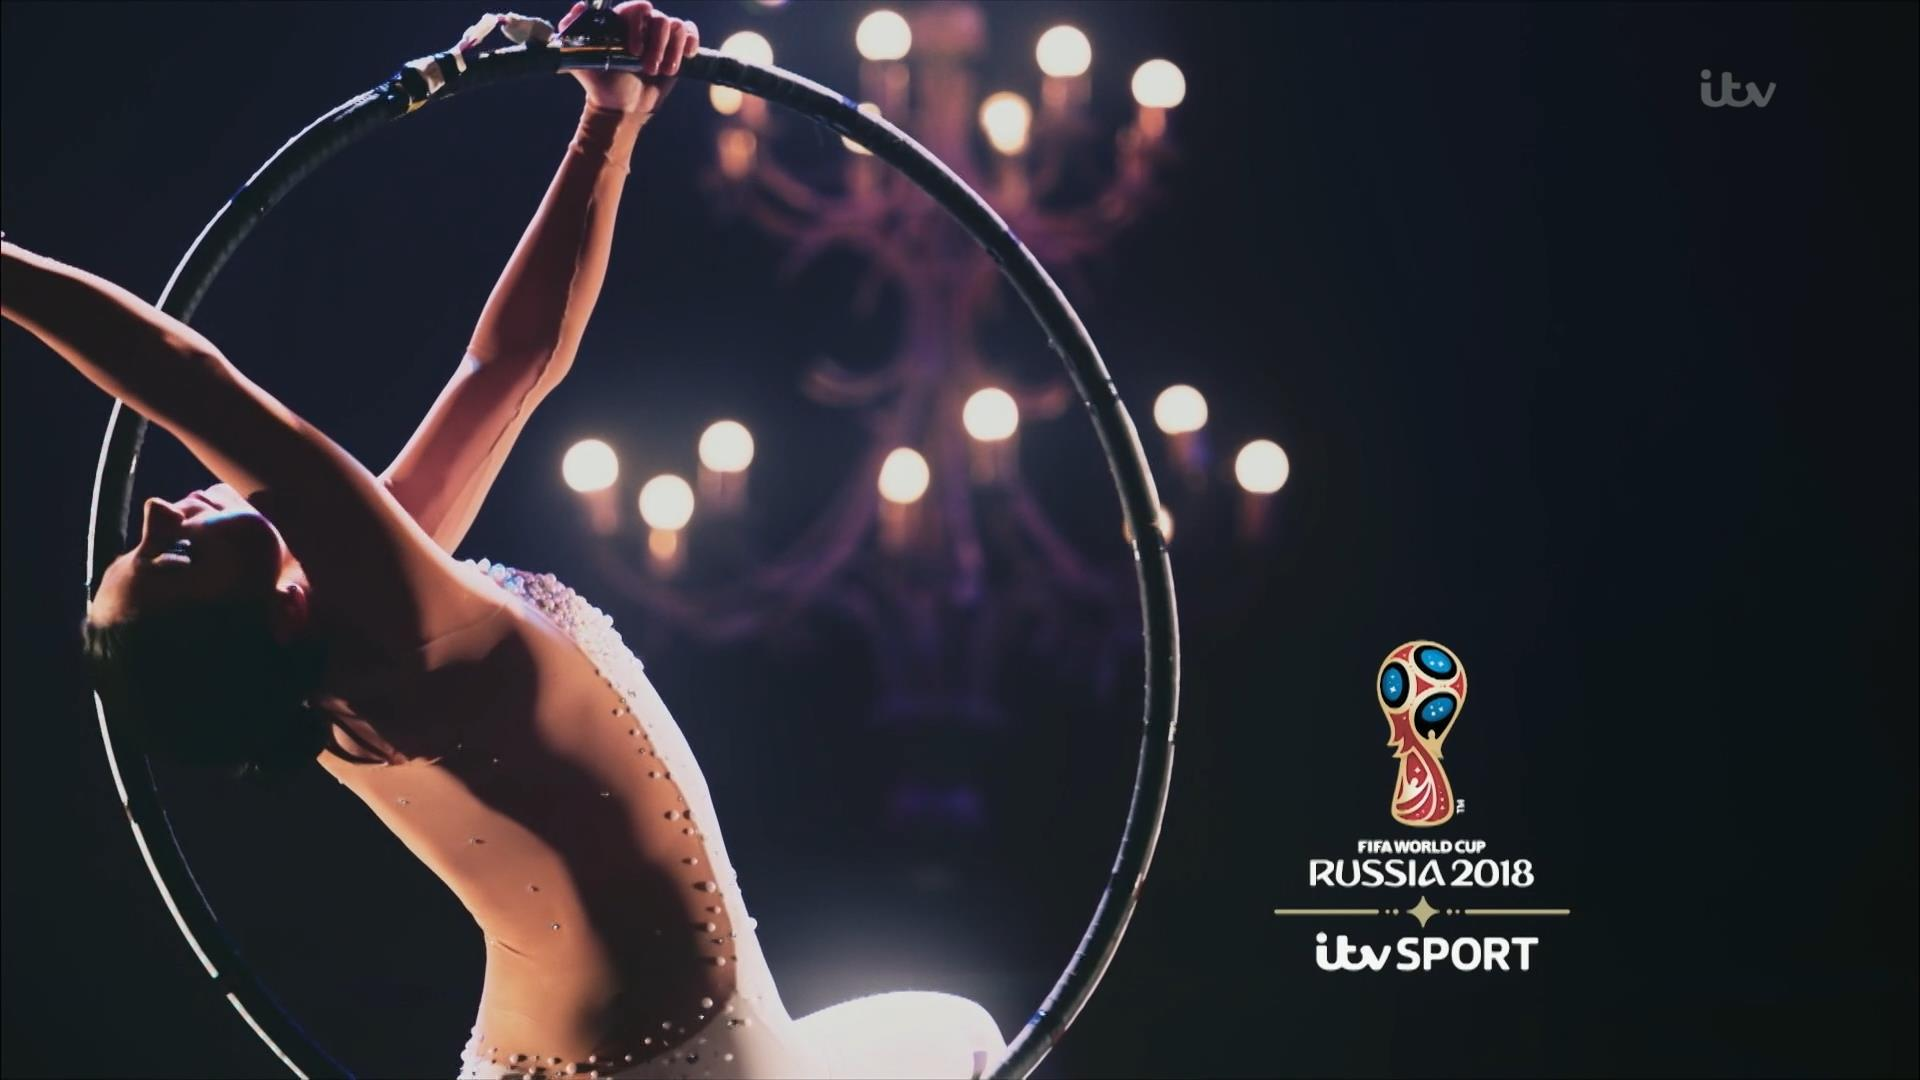 Uruguay v Portugal – World Cup 2018 – Live TV Coverage on ITV, ITV Hub